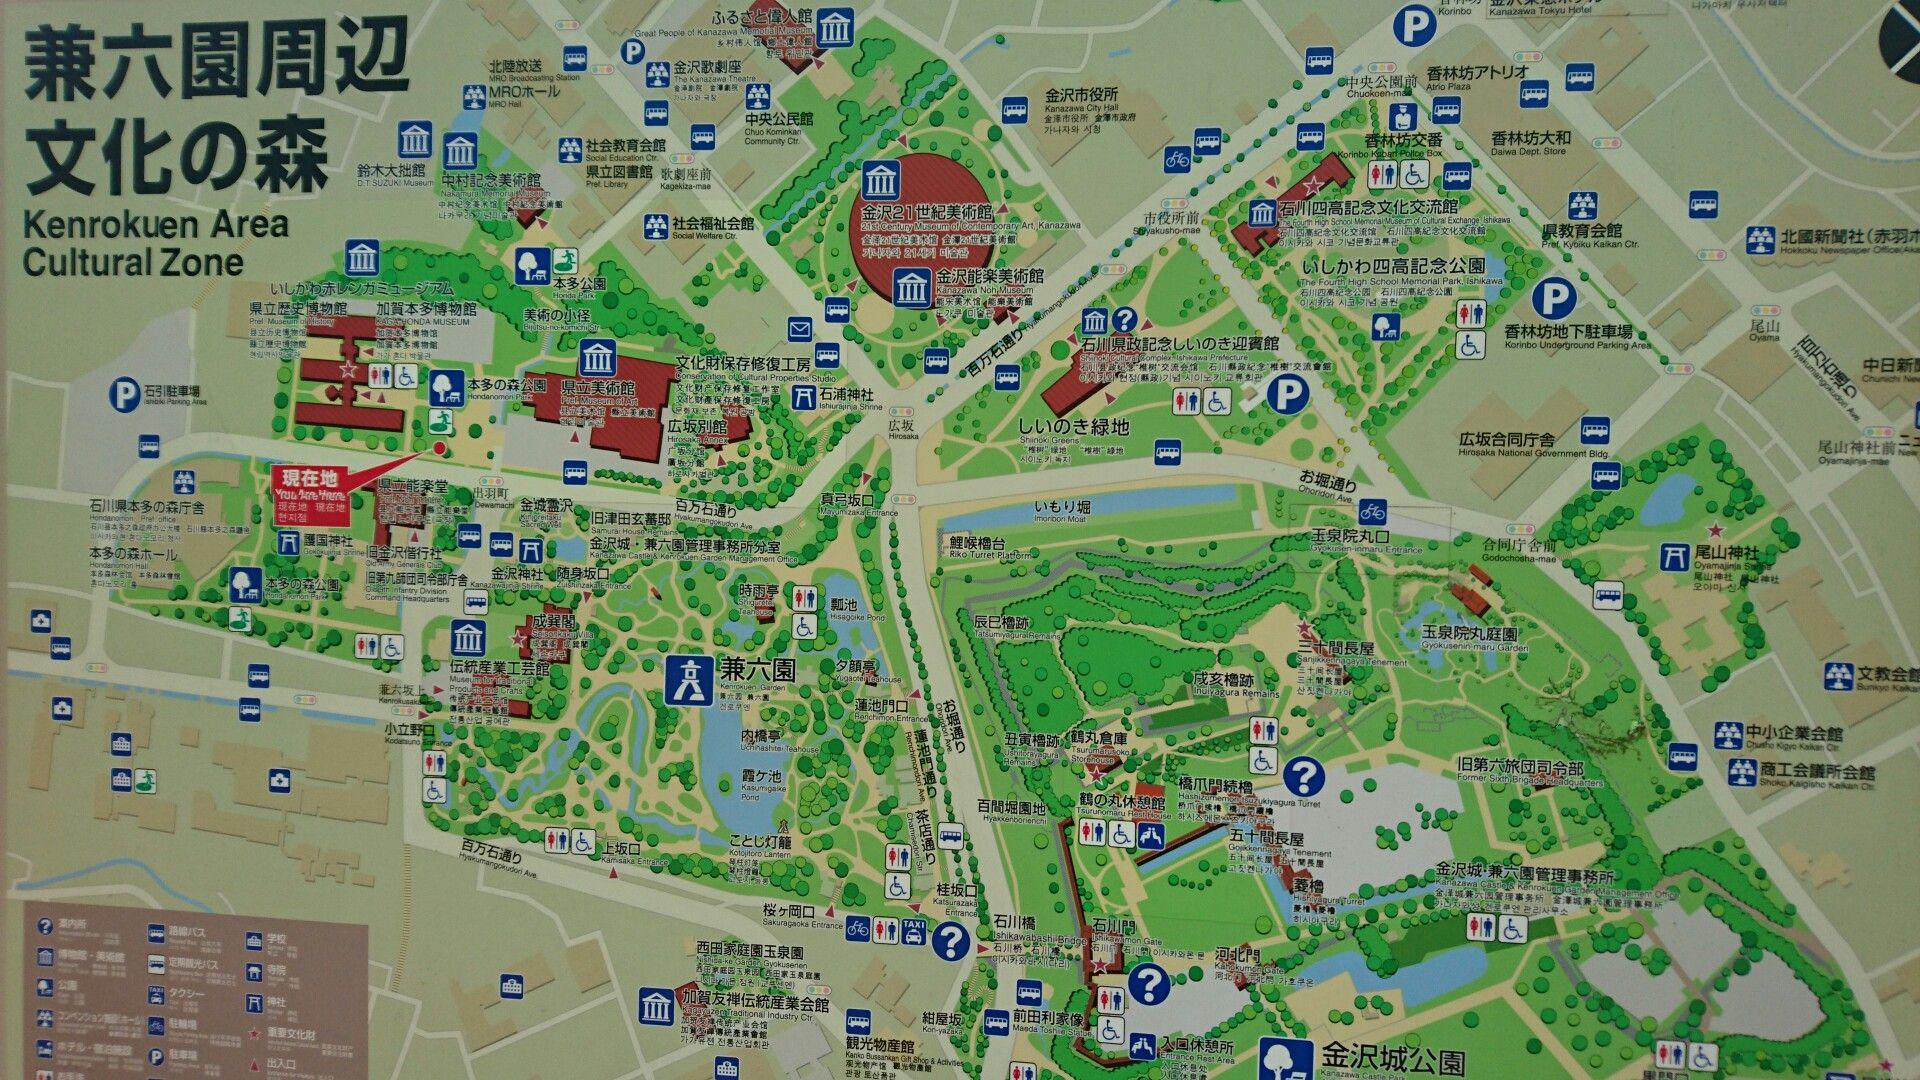 Map around the Kenrokugarden Kanazawa Japan The Kenrokugarden